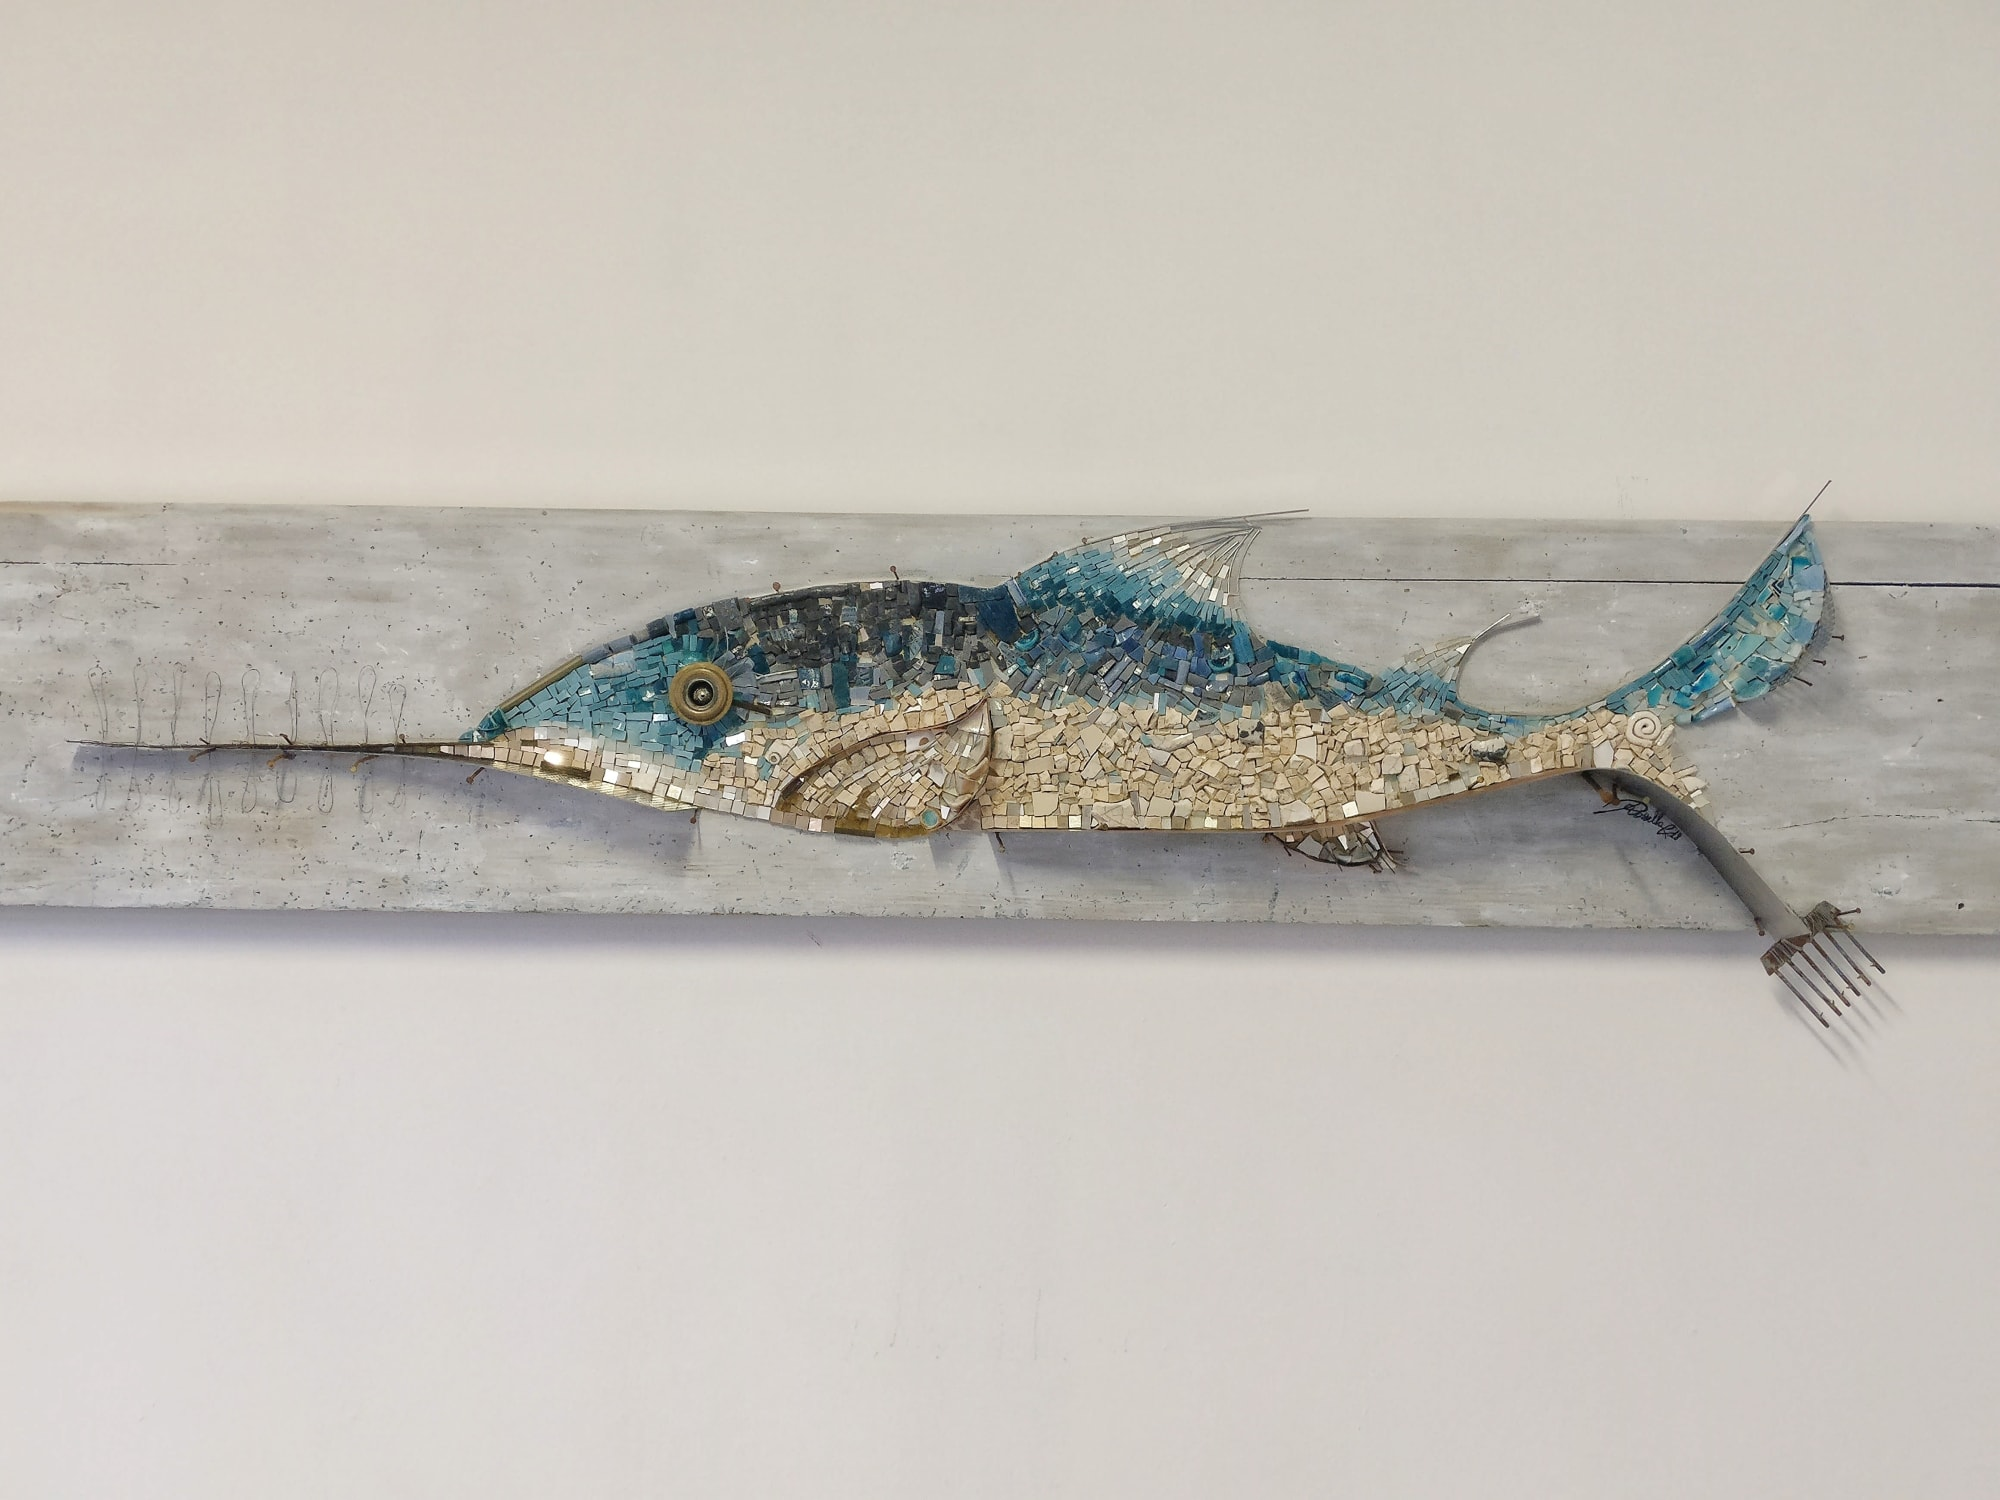 Public Mosaics by Rossella Casadio seen at Maltraversi, Arzignano - Sega (Saw)